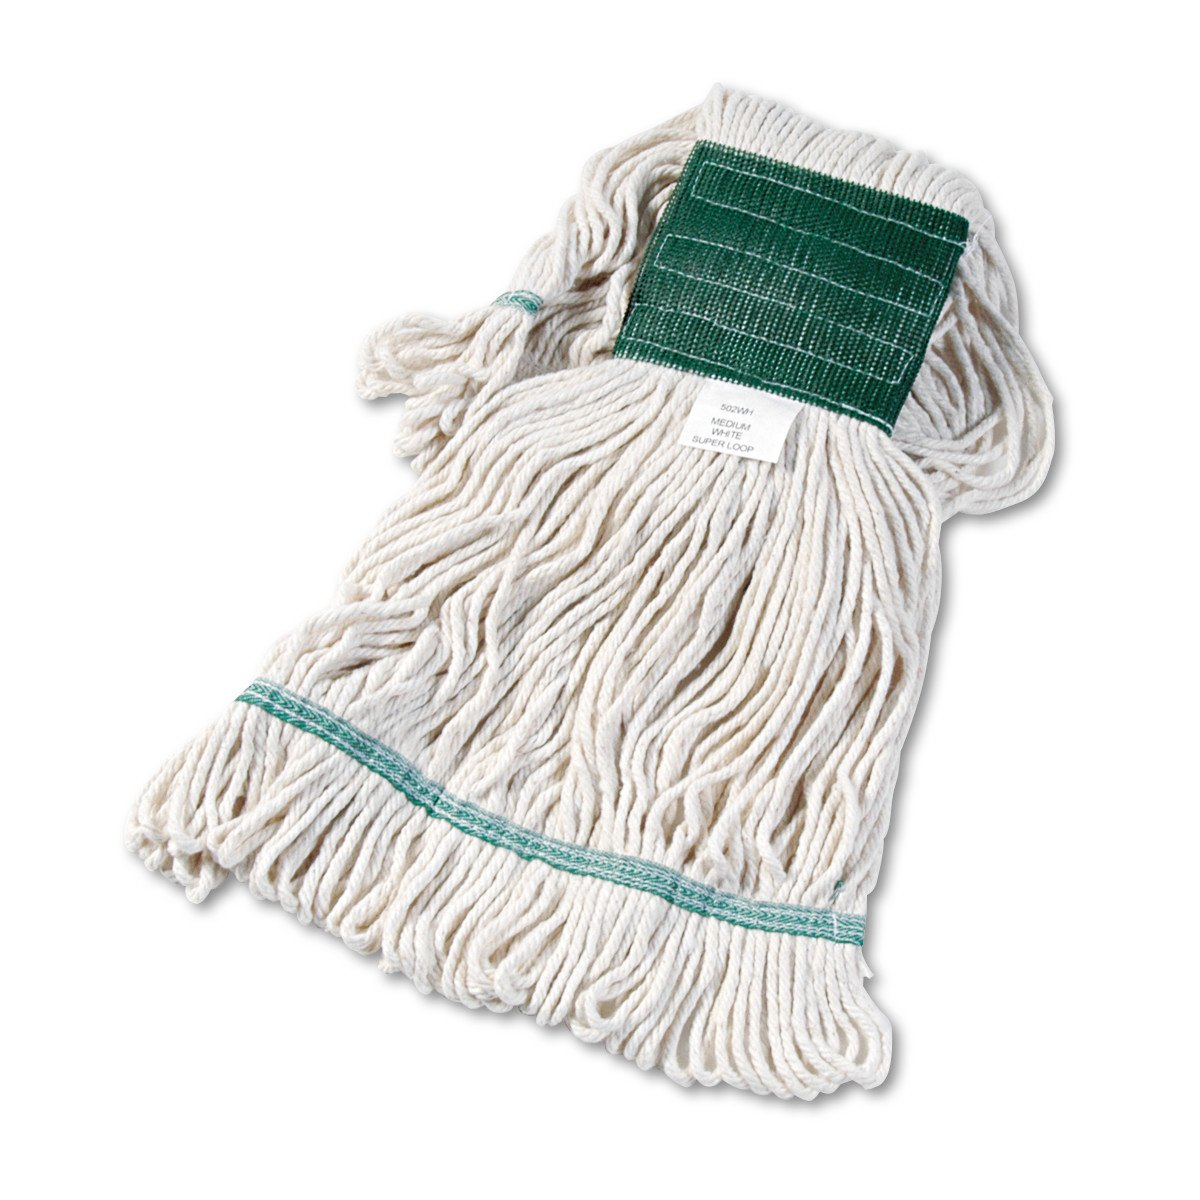 Boardwalk 502WHEA Super Loop Wet Mop Head, Cotton/Synthetic, Medium Size, White